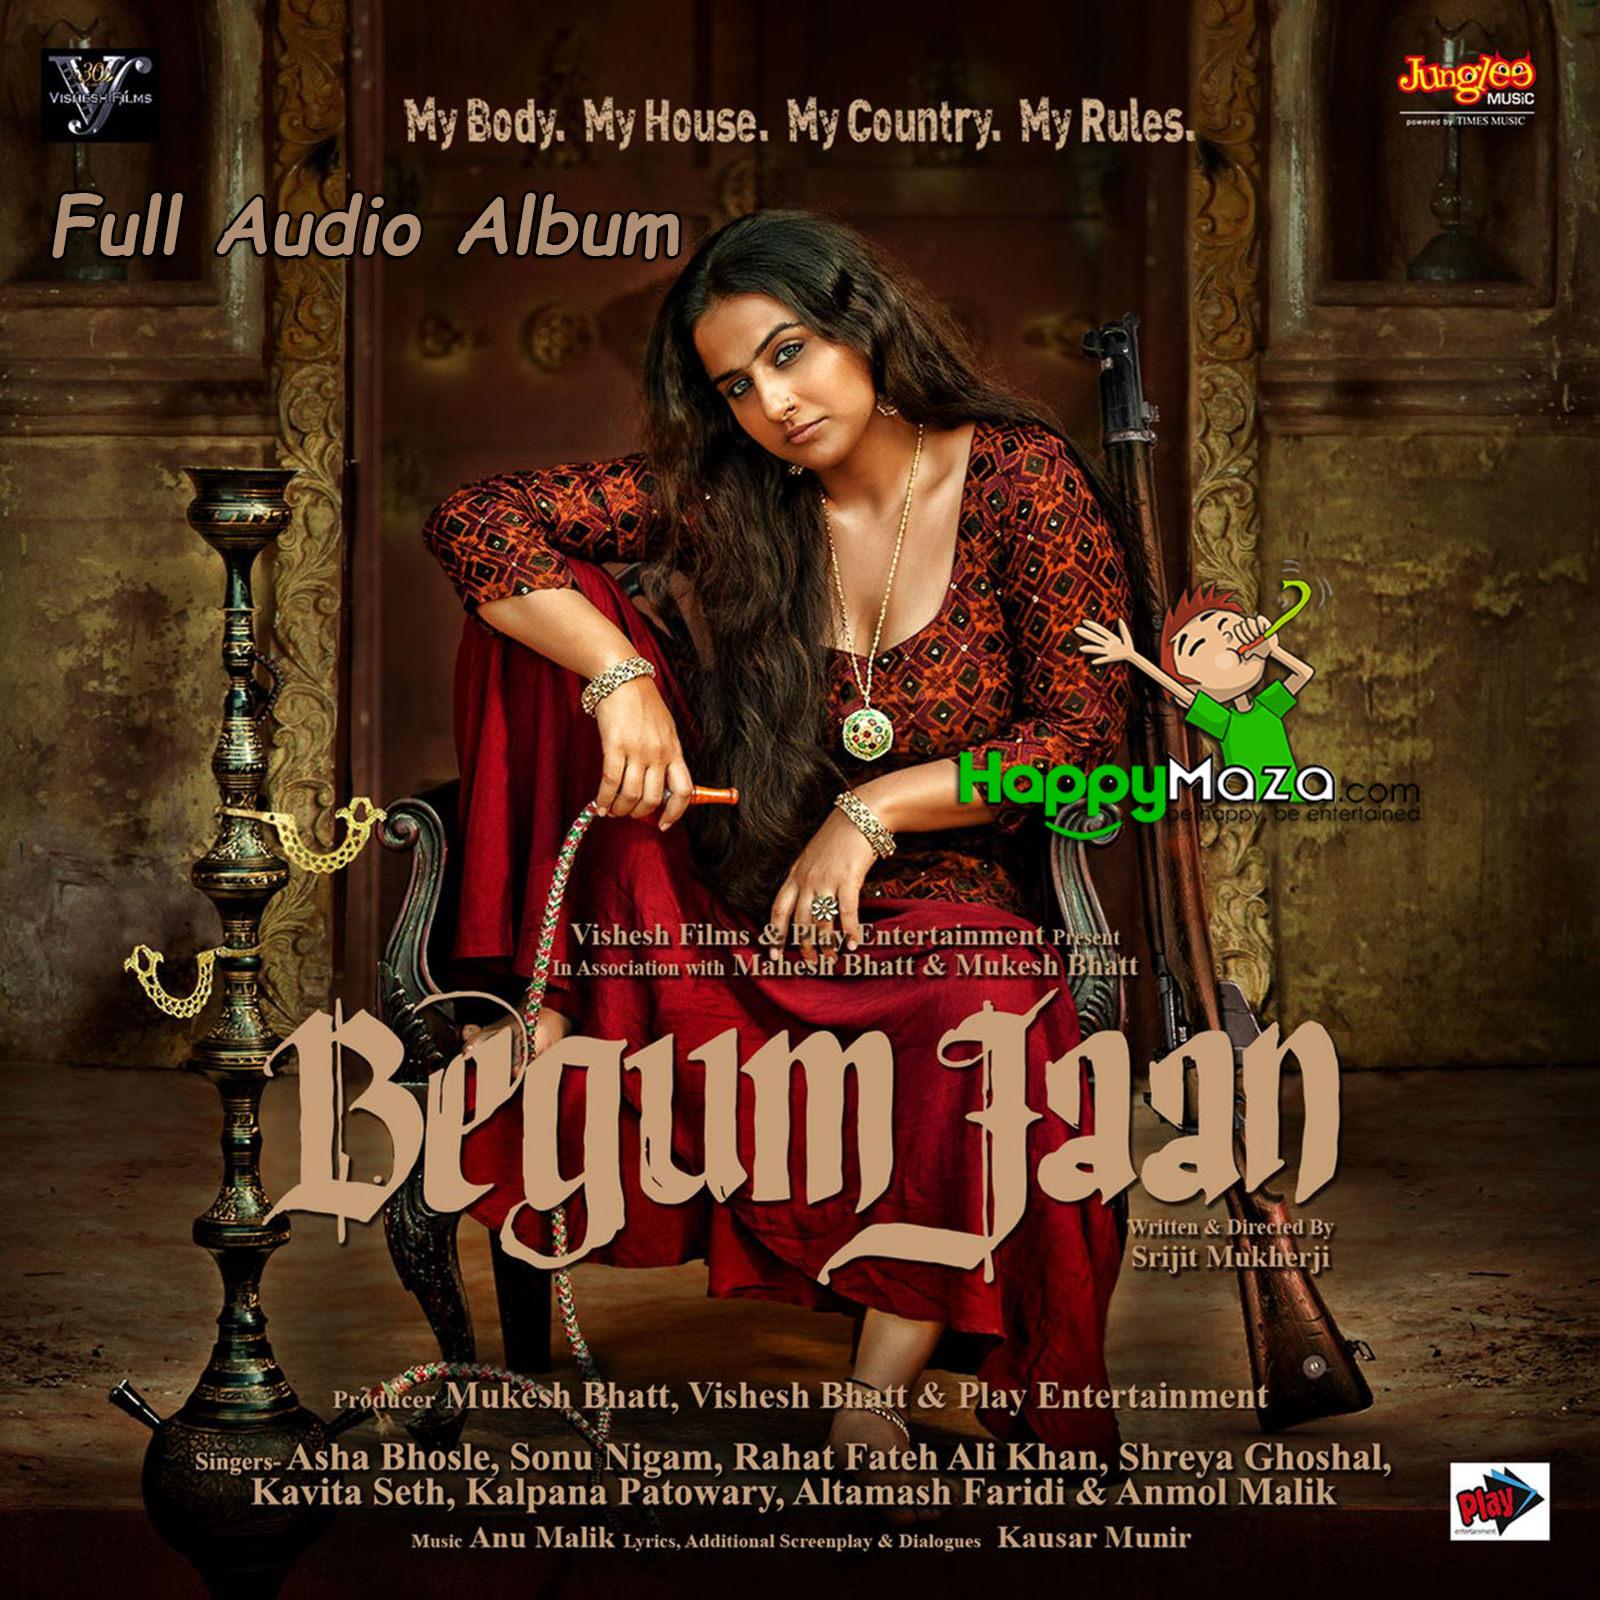 Begum Jaan Lyrics - Full Song - 2017 | HappyMaza | 1600 x 1600 jpeg 488kB